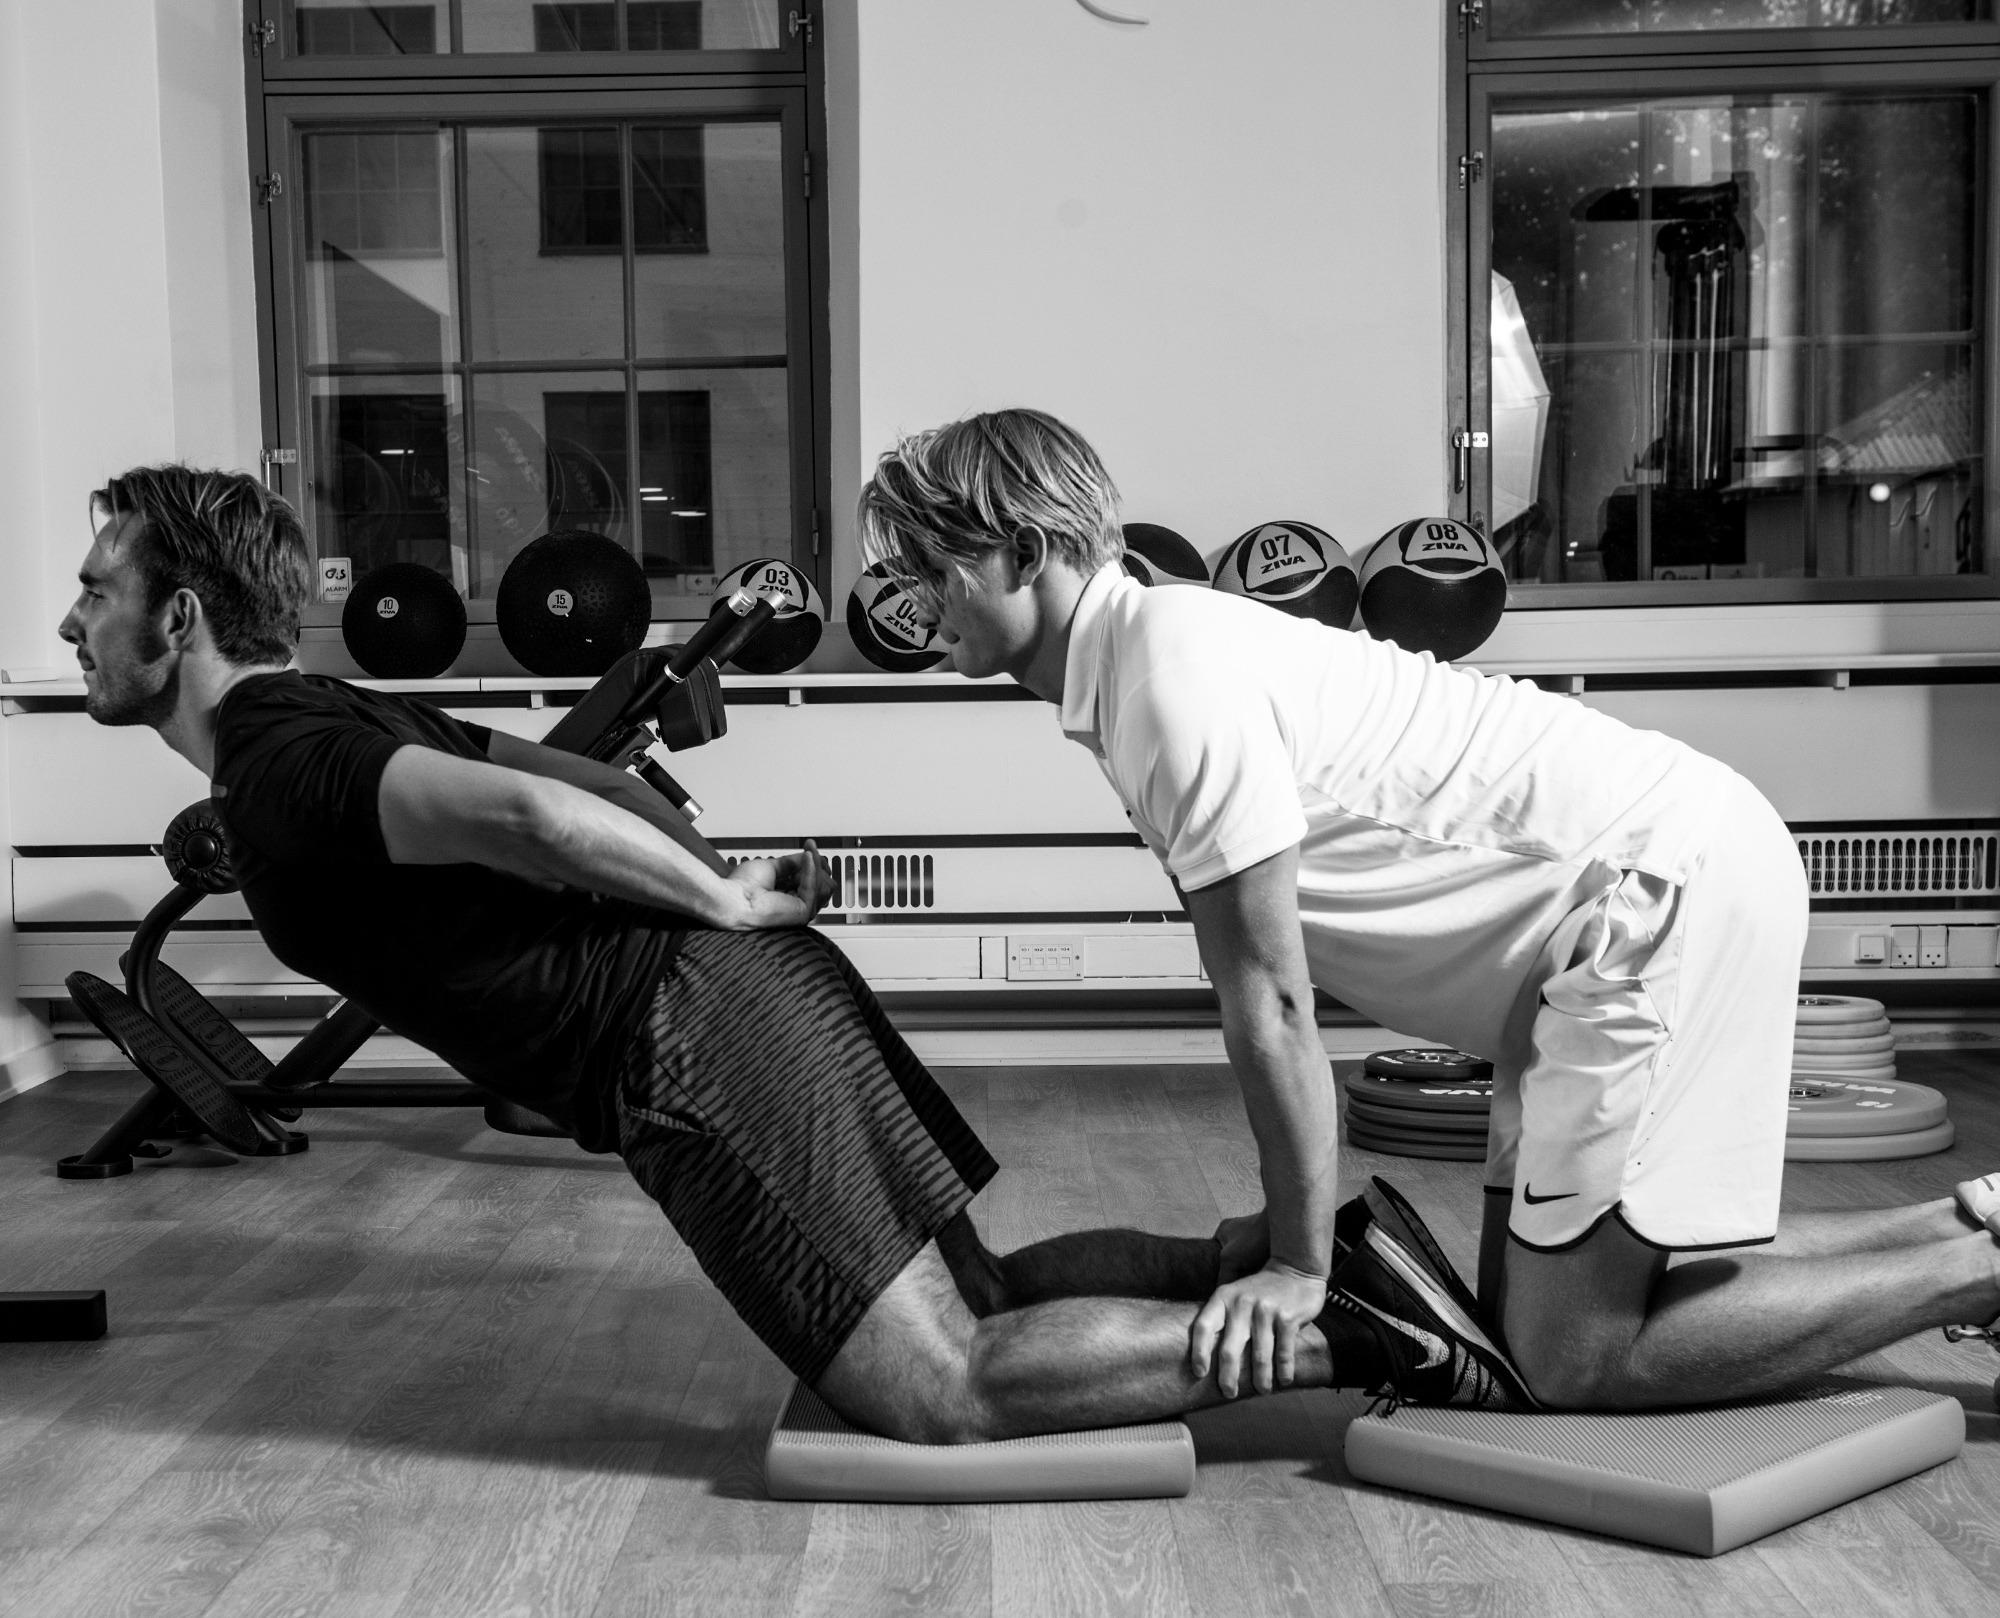 Skadesforebyggende træning i Sportsfysioterapien